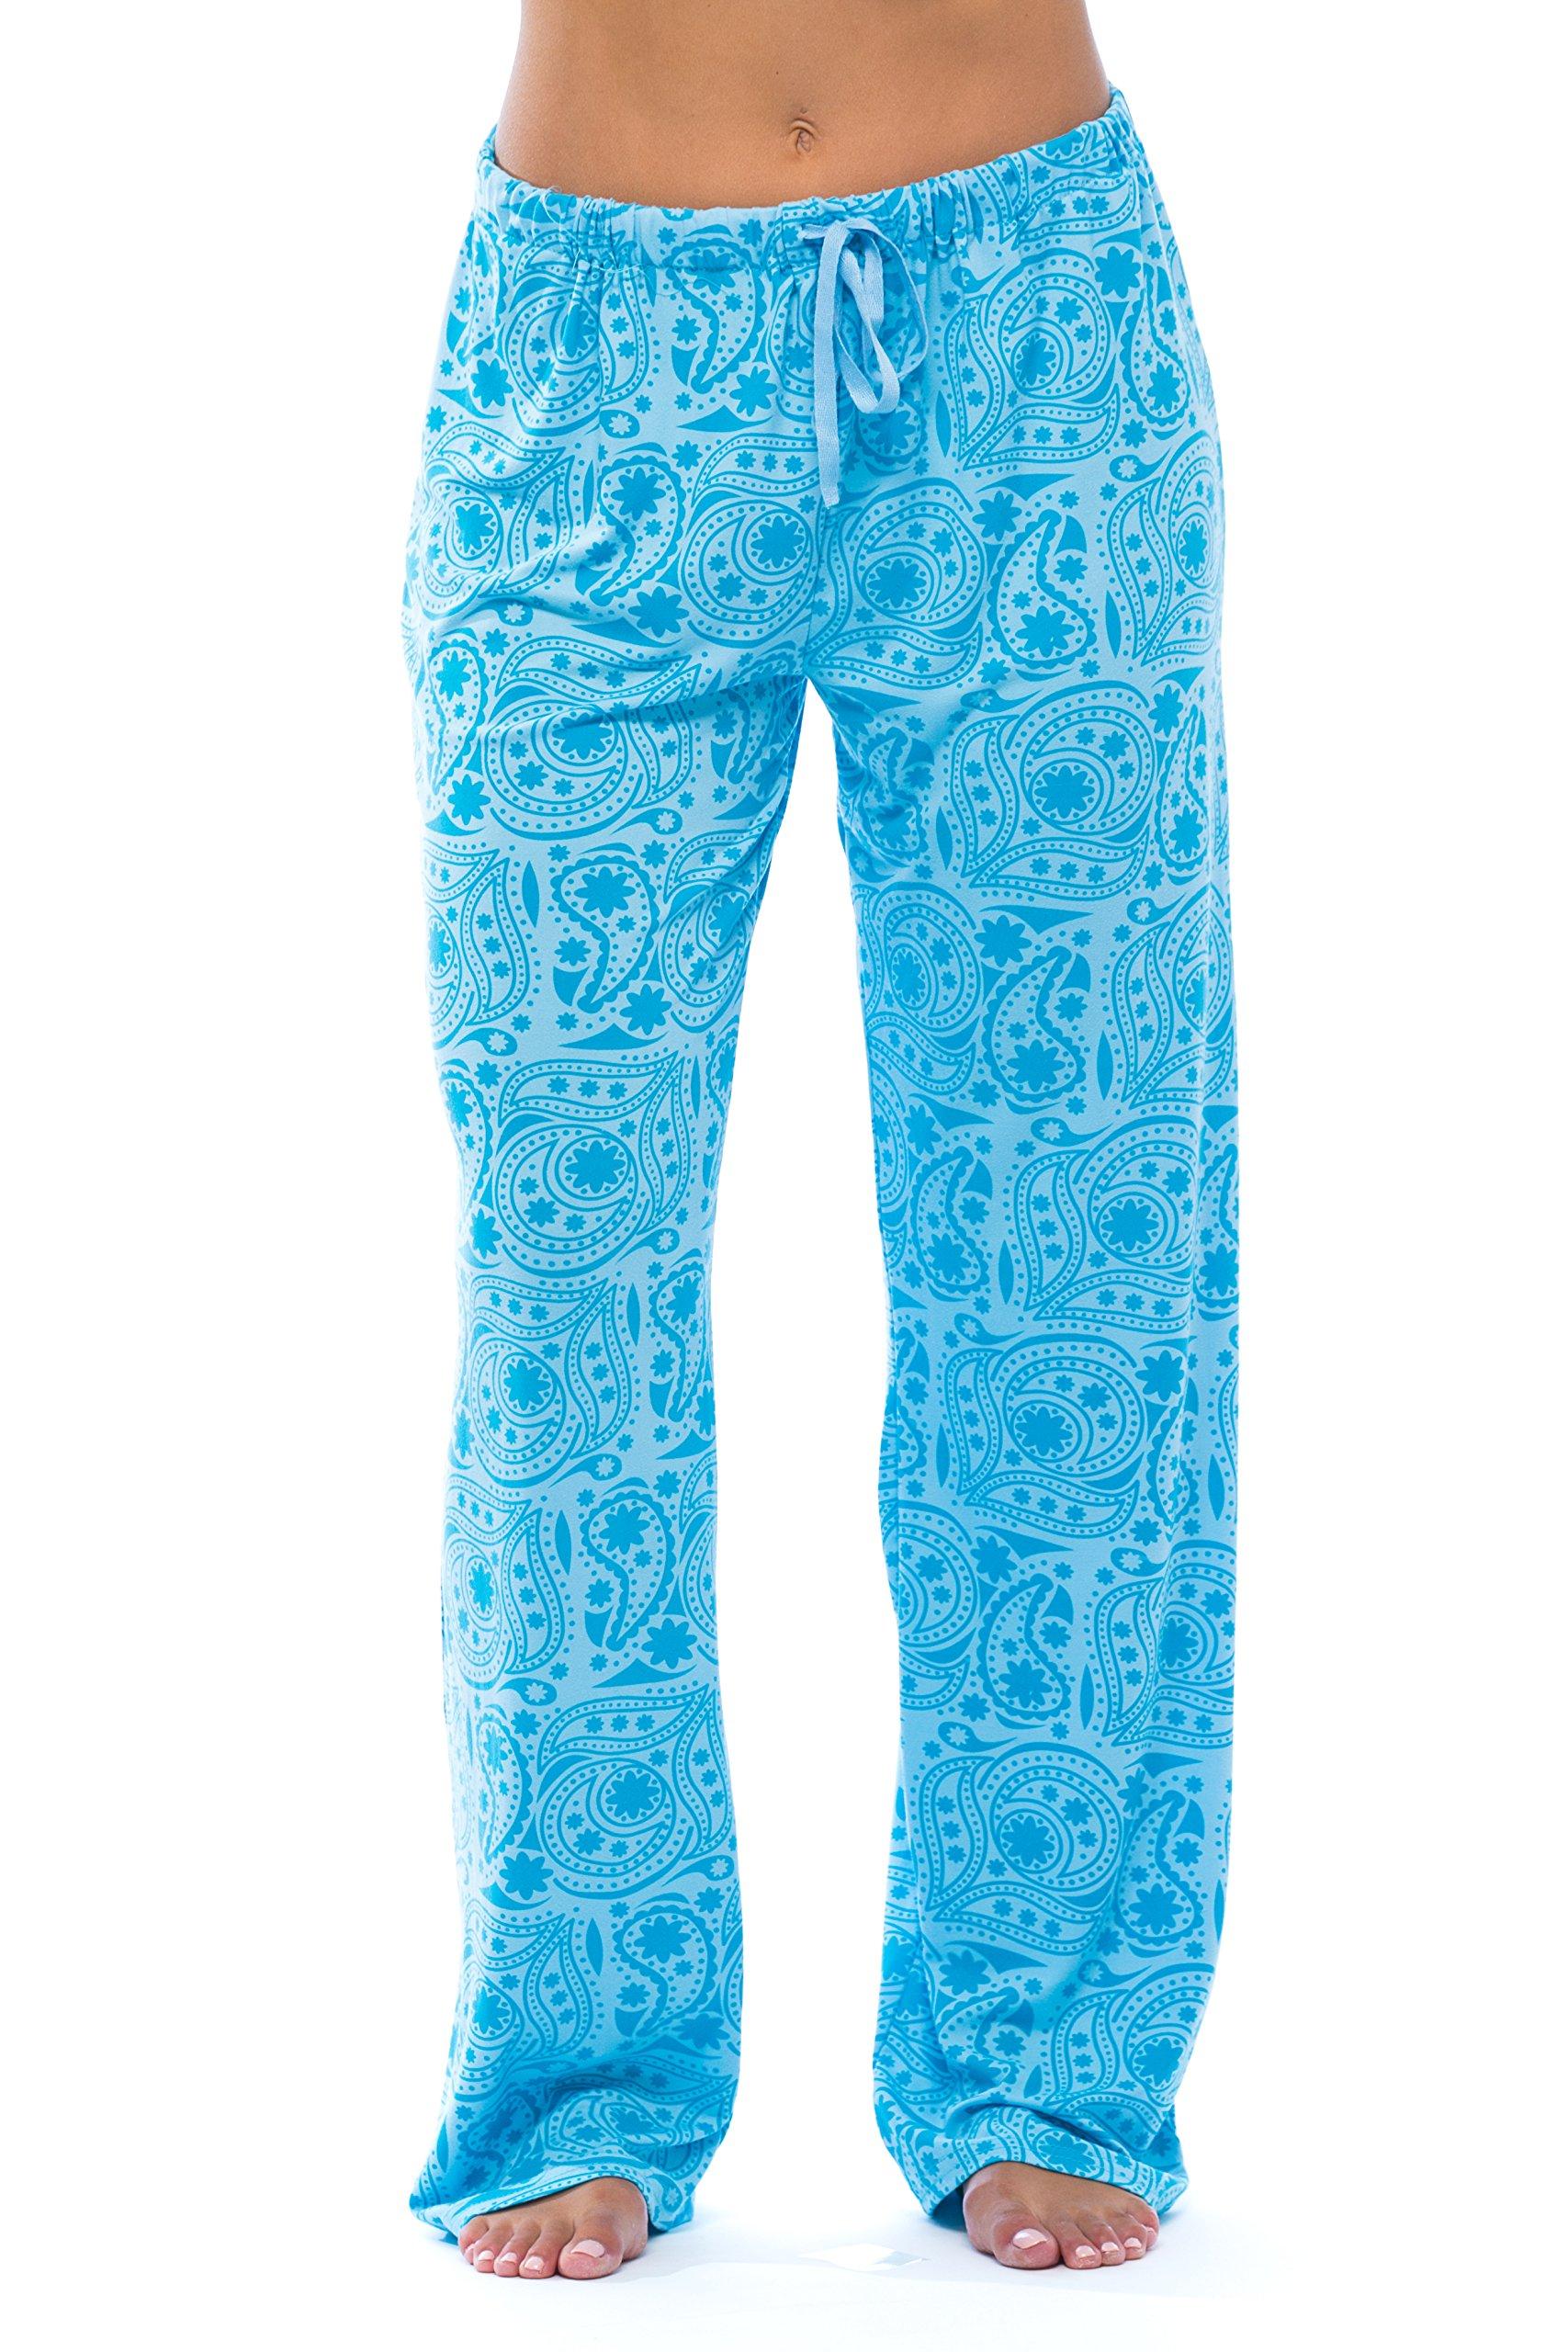 6333-10085-3X Just Love Women Pajama Pants - PJs - Sleepwear Paisley Aqua 3X Plus